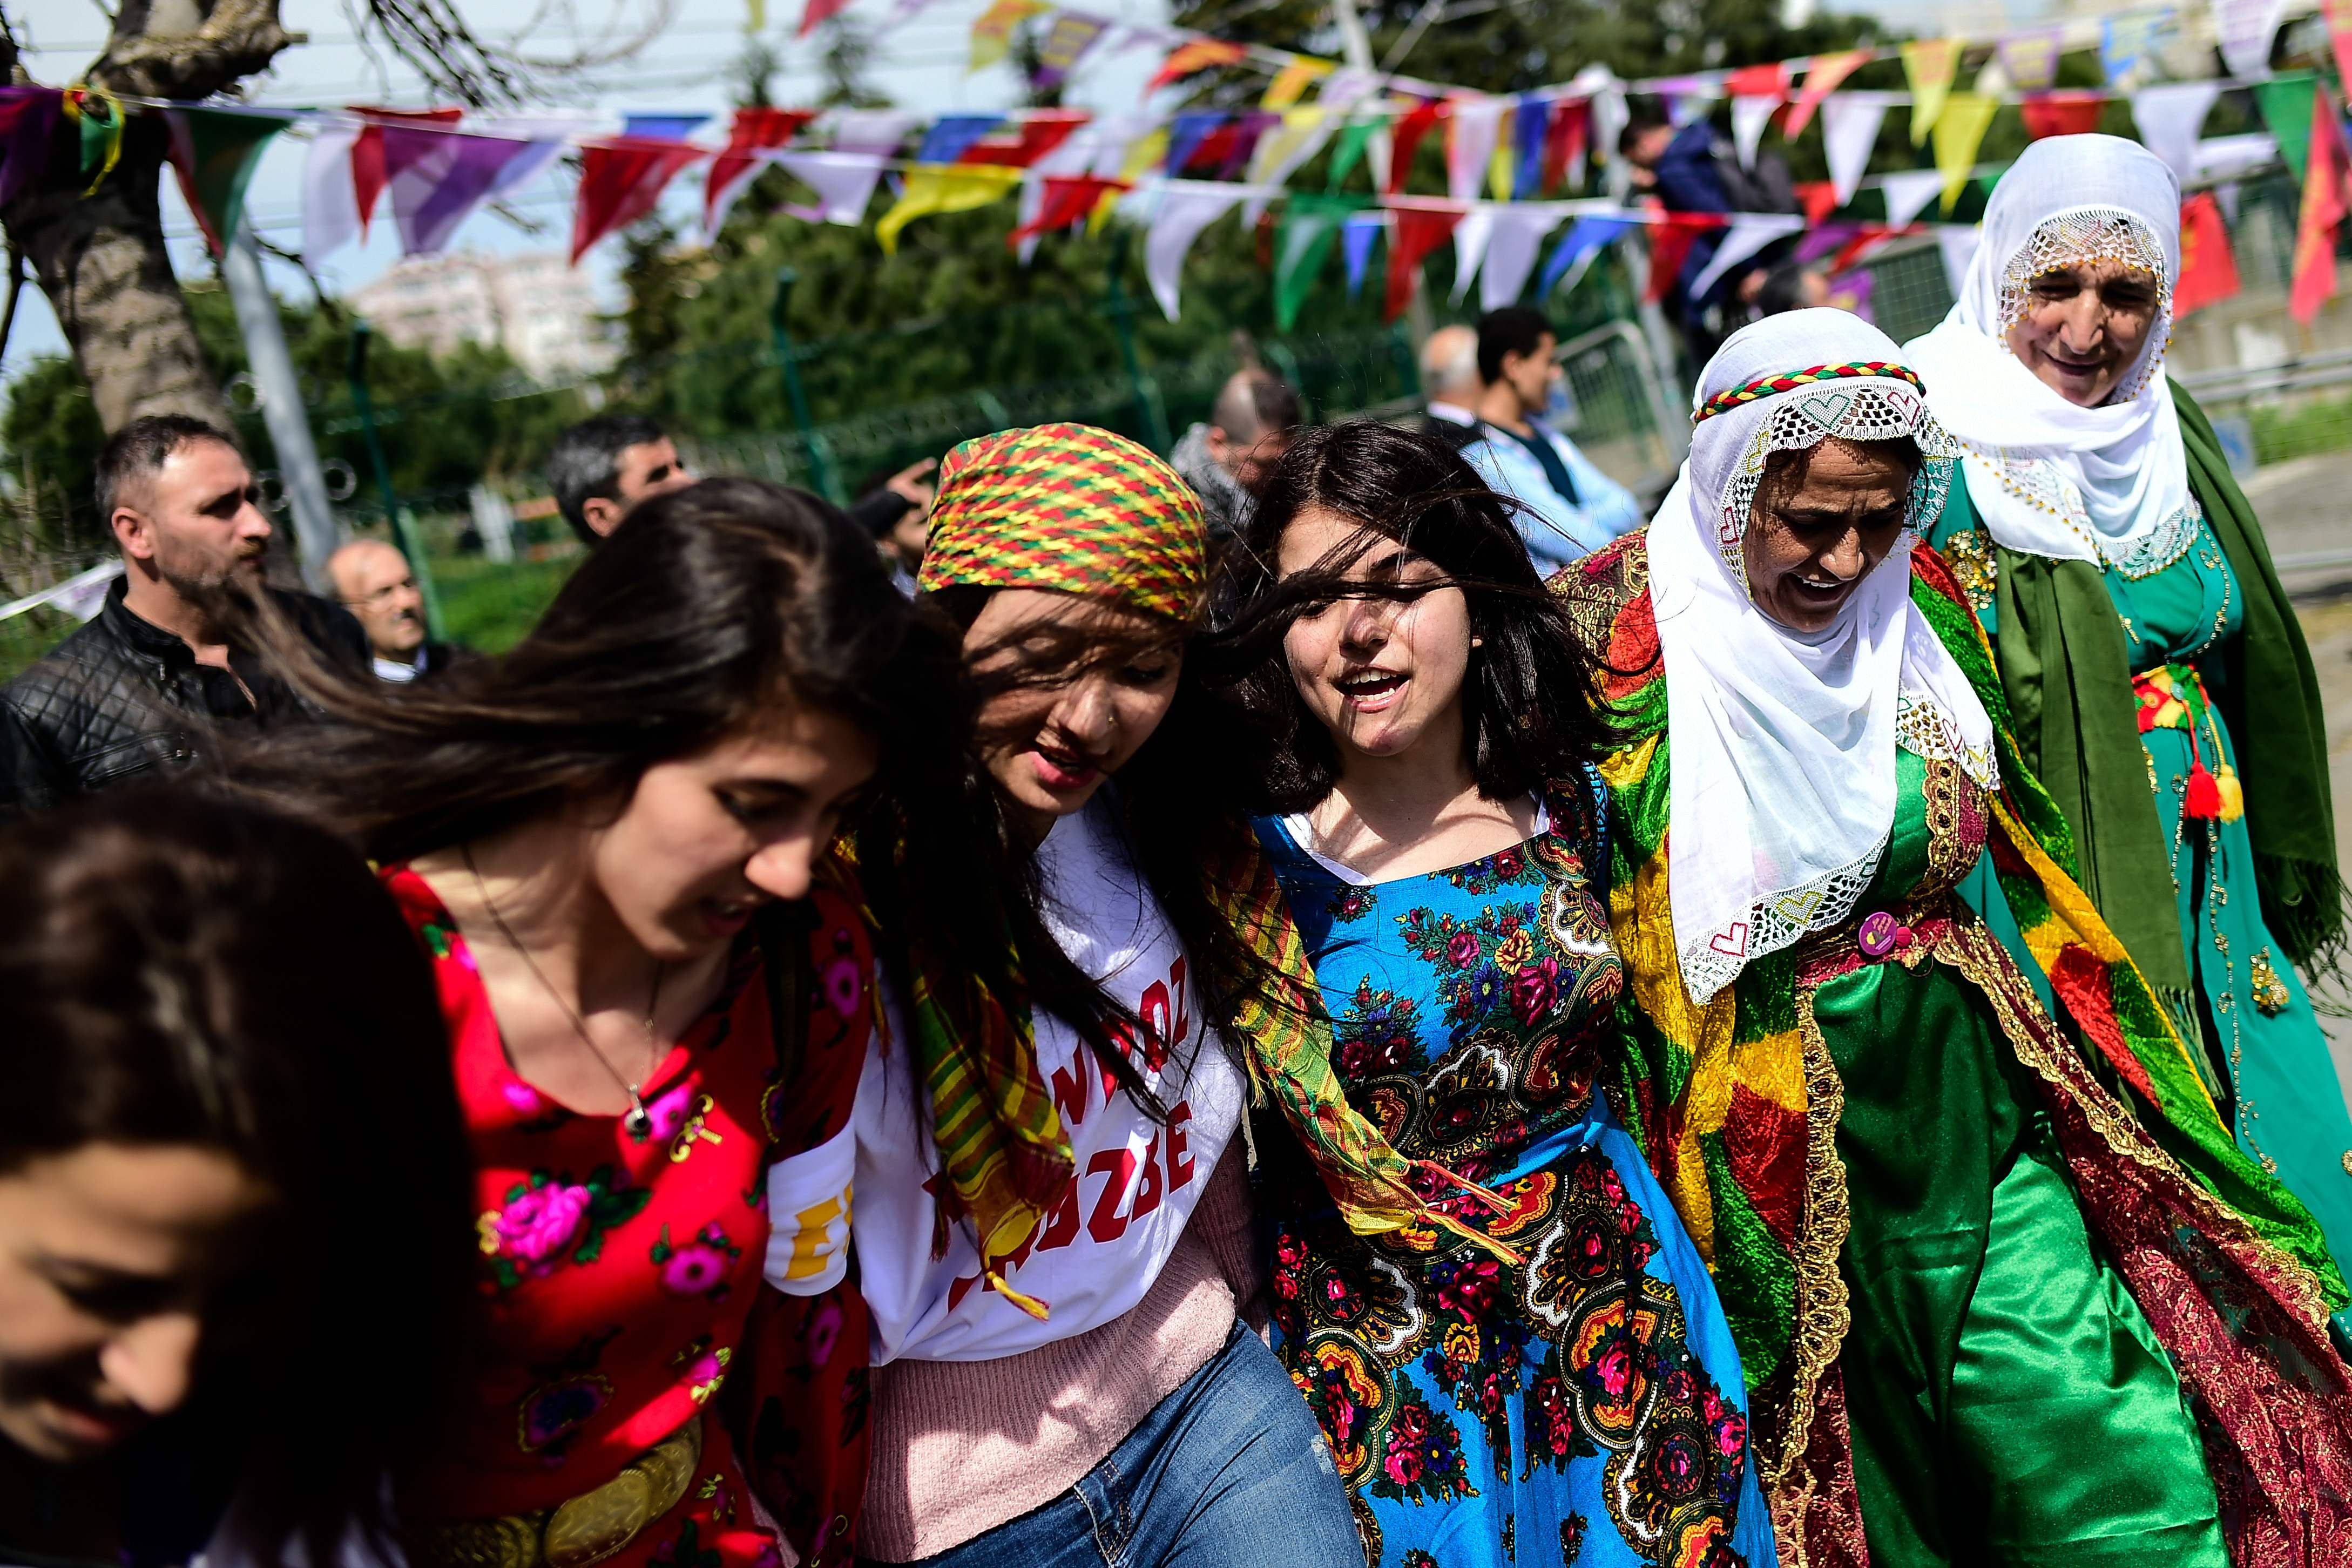 TURKEY-KURDS-NEW YEAR-NOWRUZ